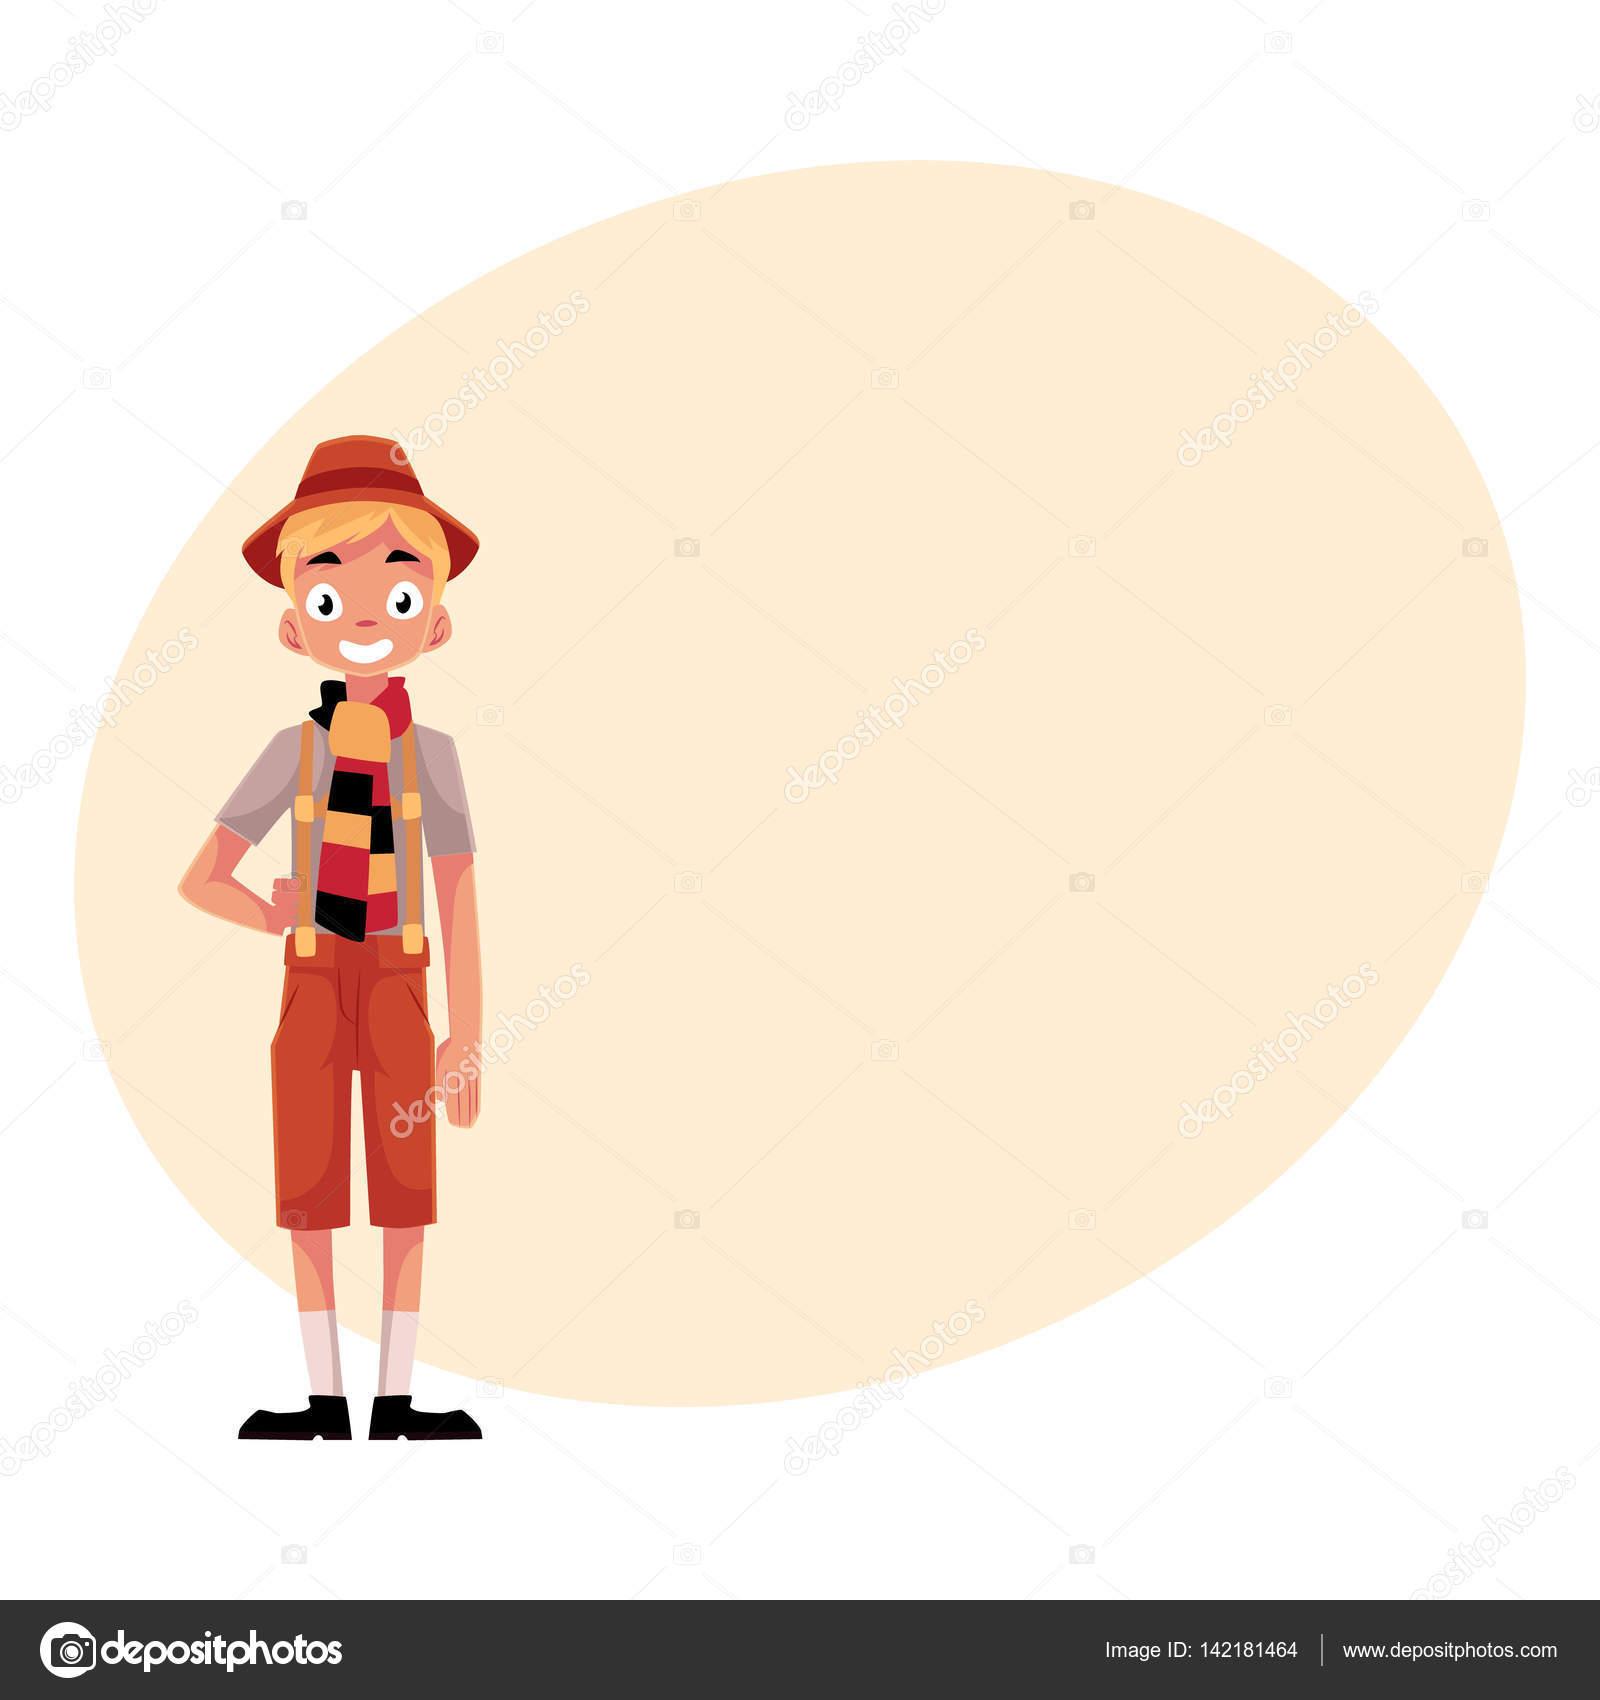 Joven con traje tradicional de Oktoberfest bávaro alemán c5f01eb3980